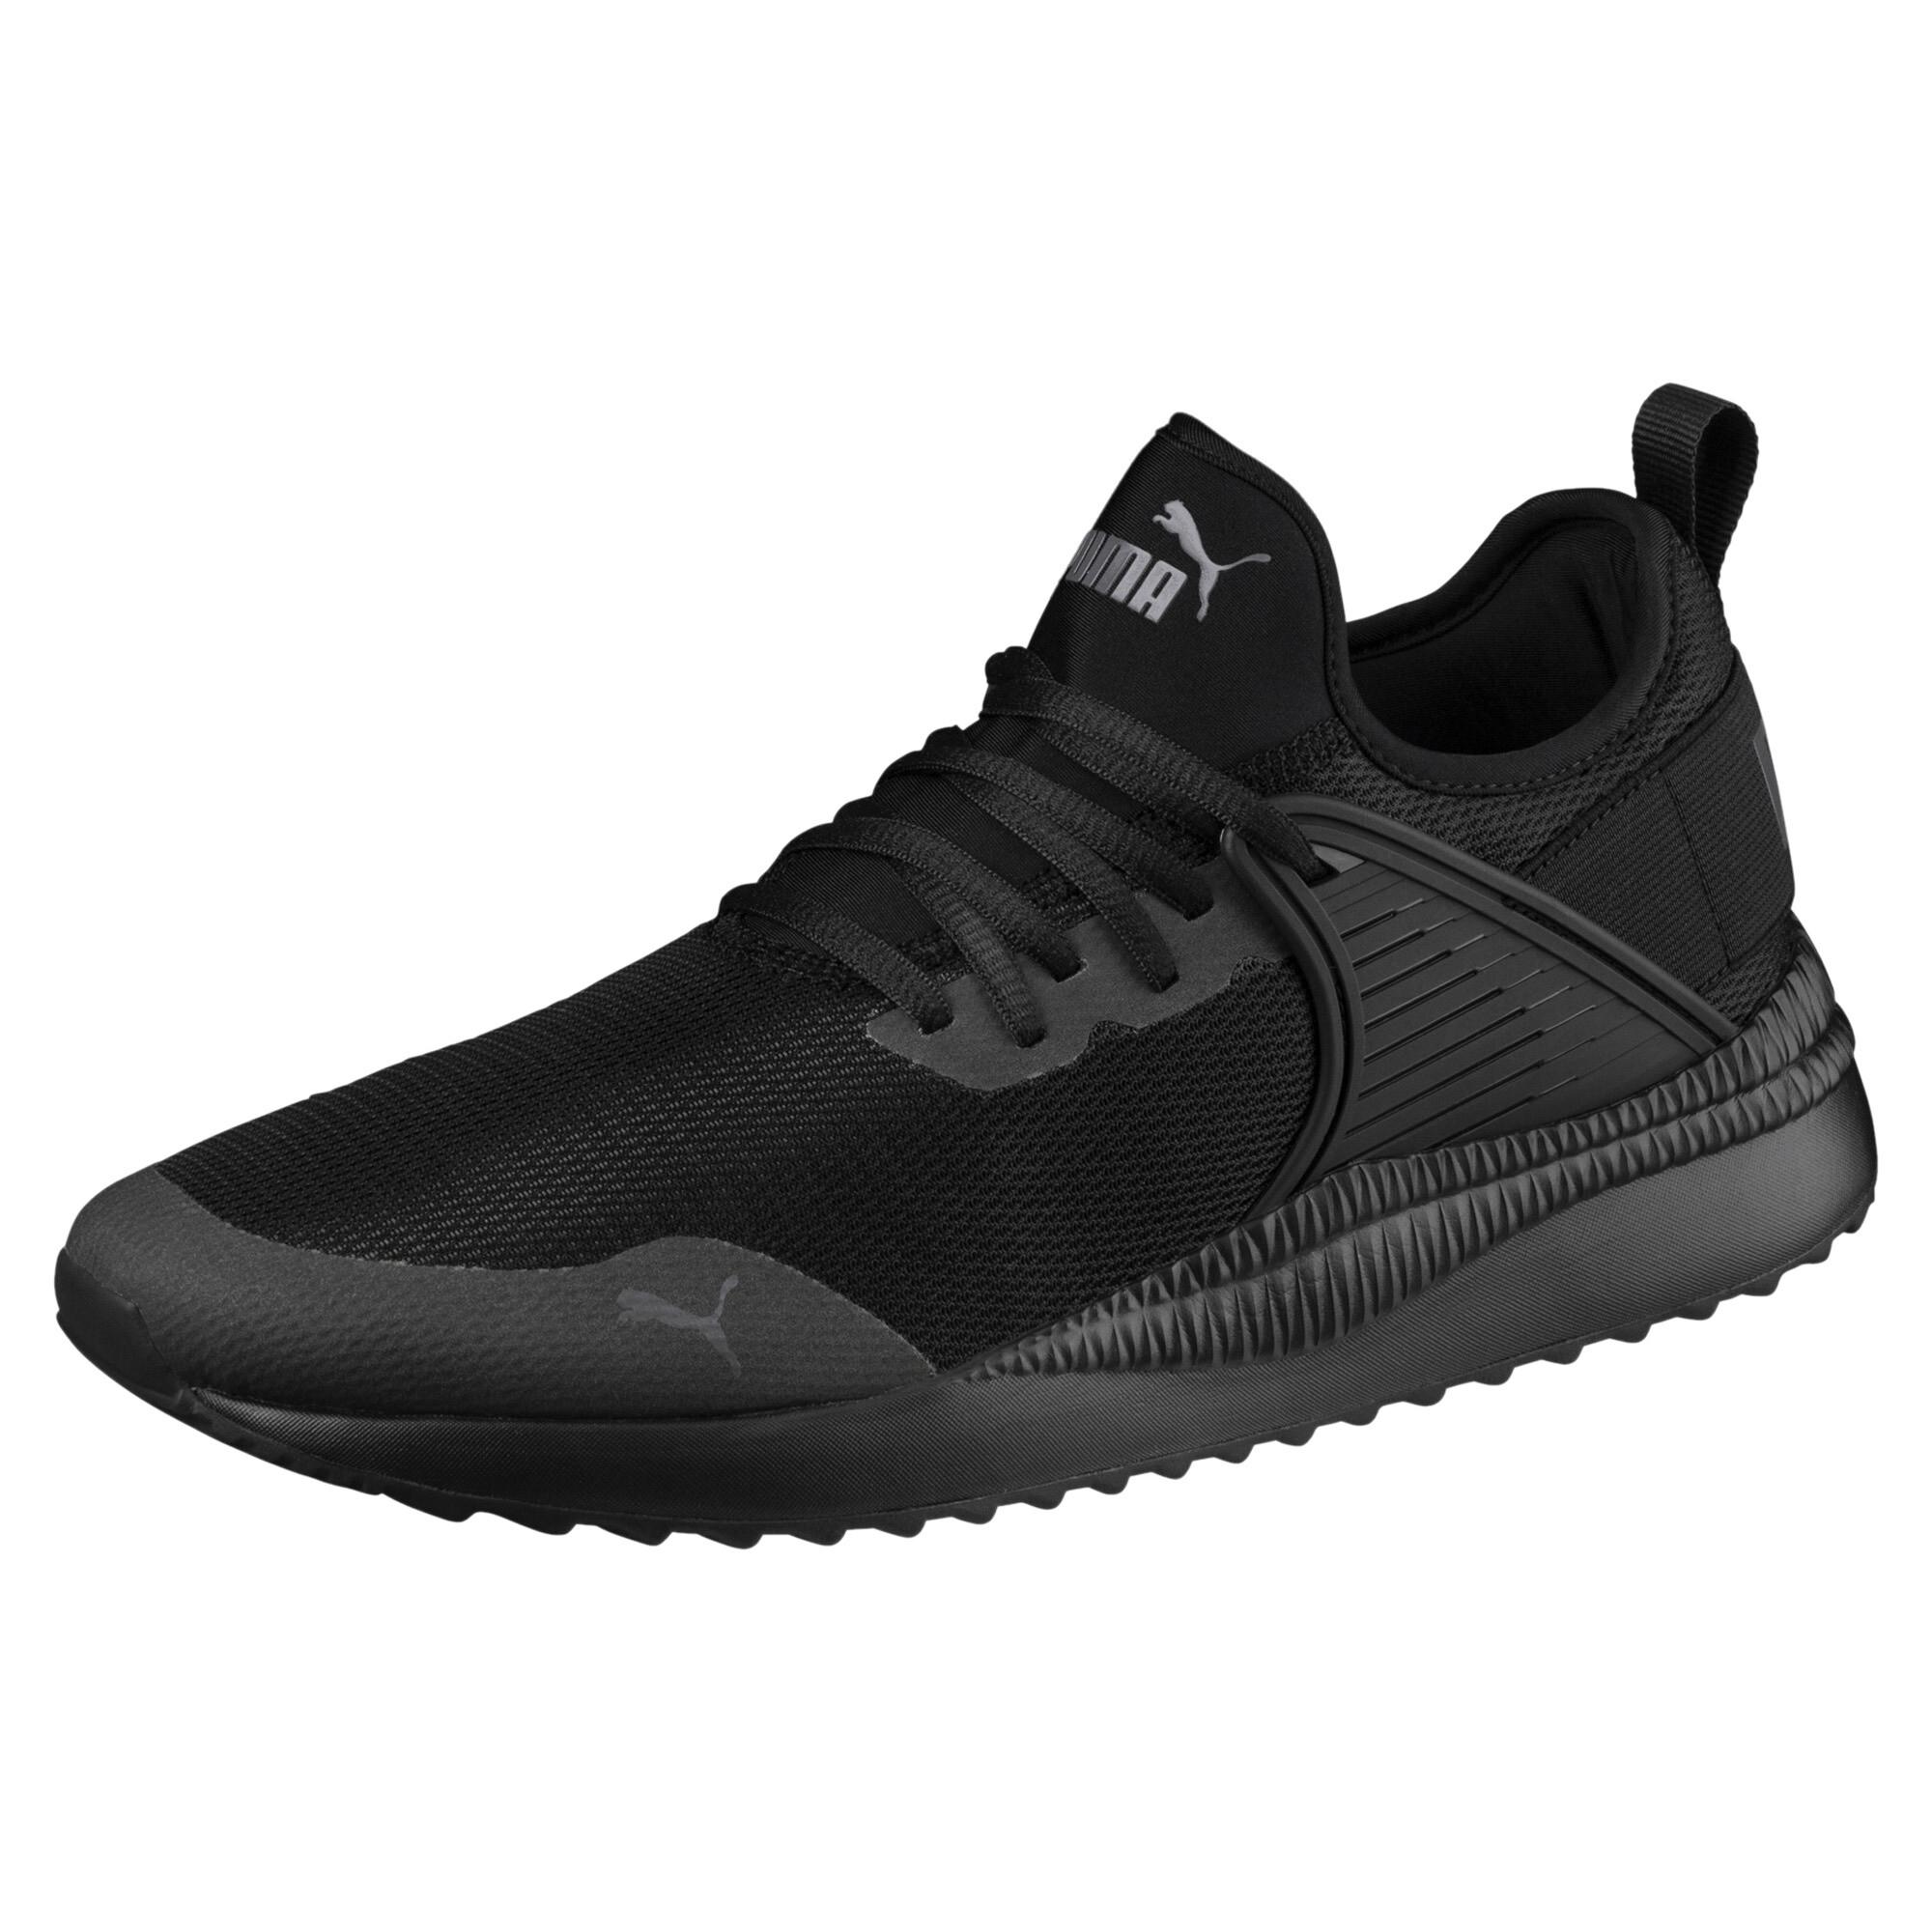 PUMA-Pacer-Next-Cage-Sneakers-Men-Shoe-Basics thumbnail 4